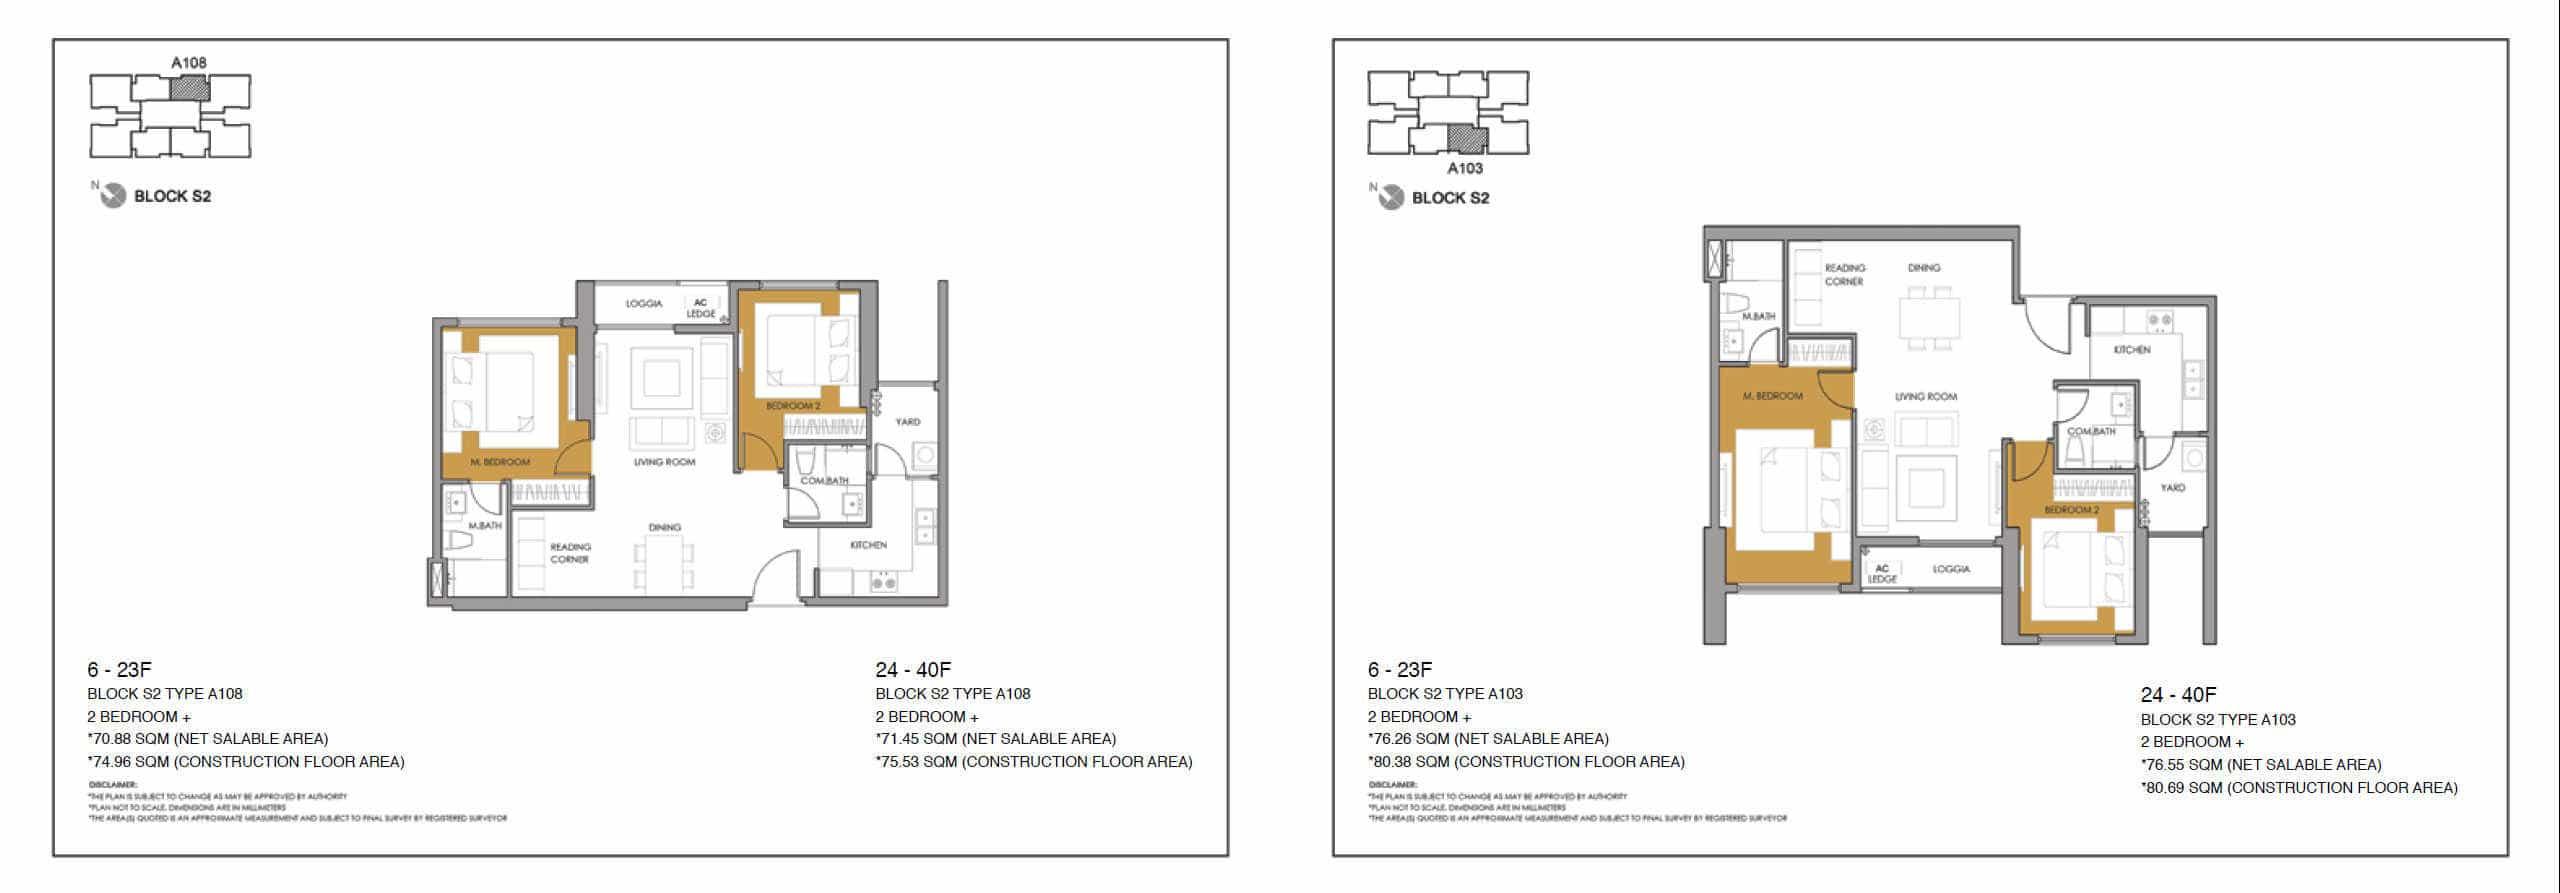 floor-plan-a108-103-1